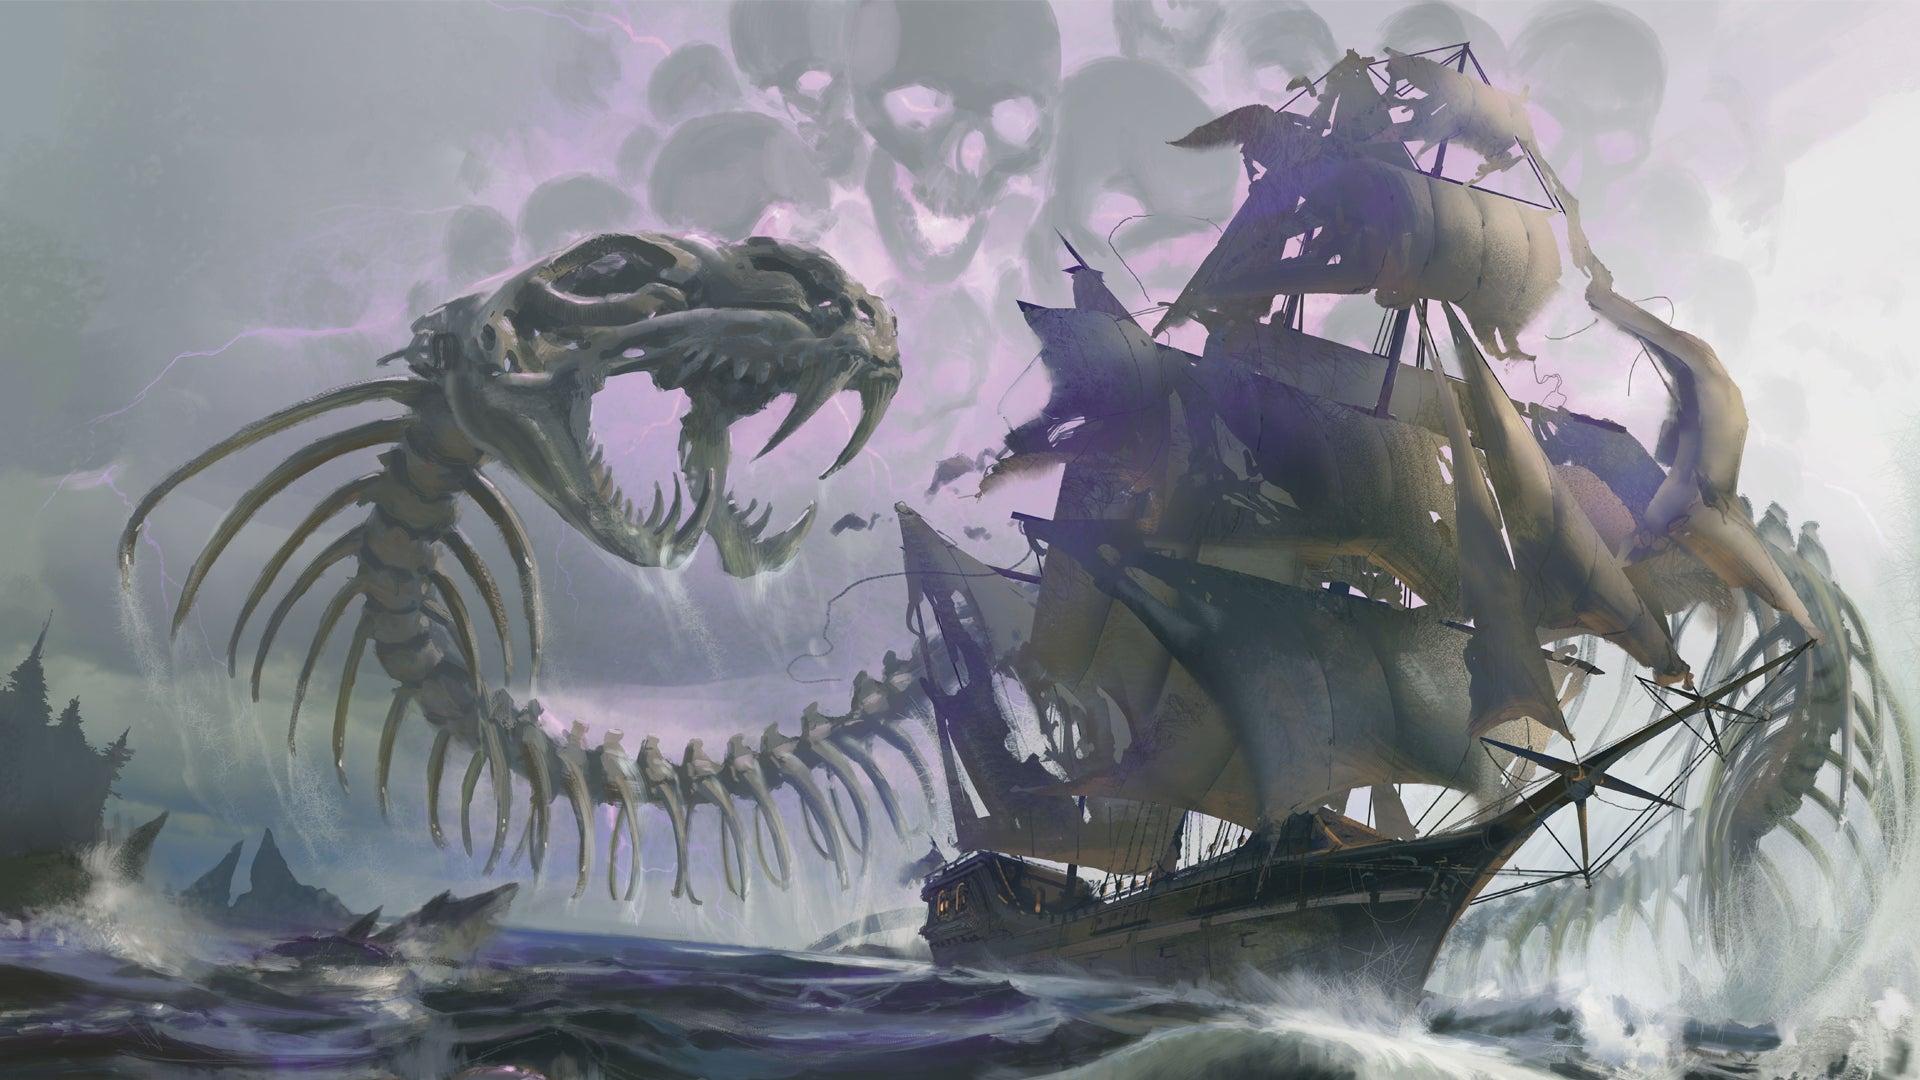 Tasha's Cauldron of Everything D&D RPG artwork 7